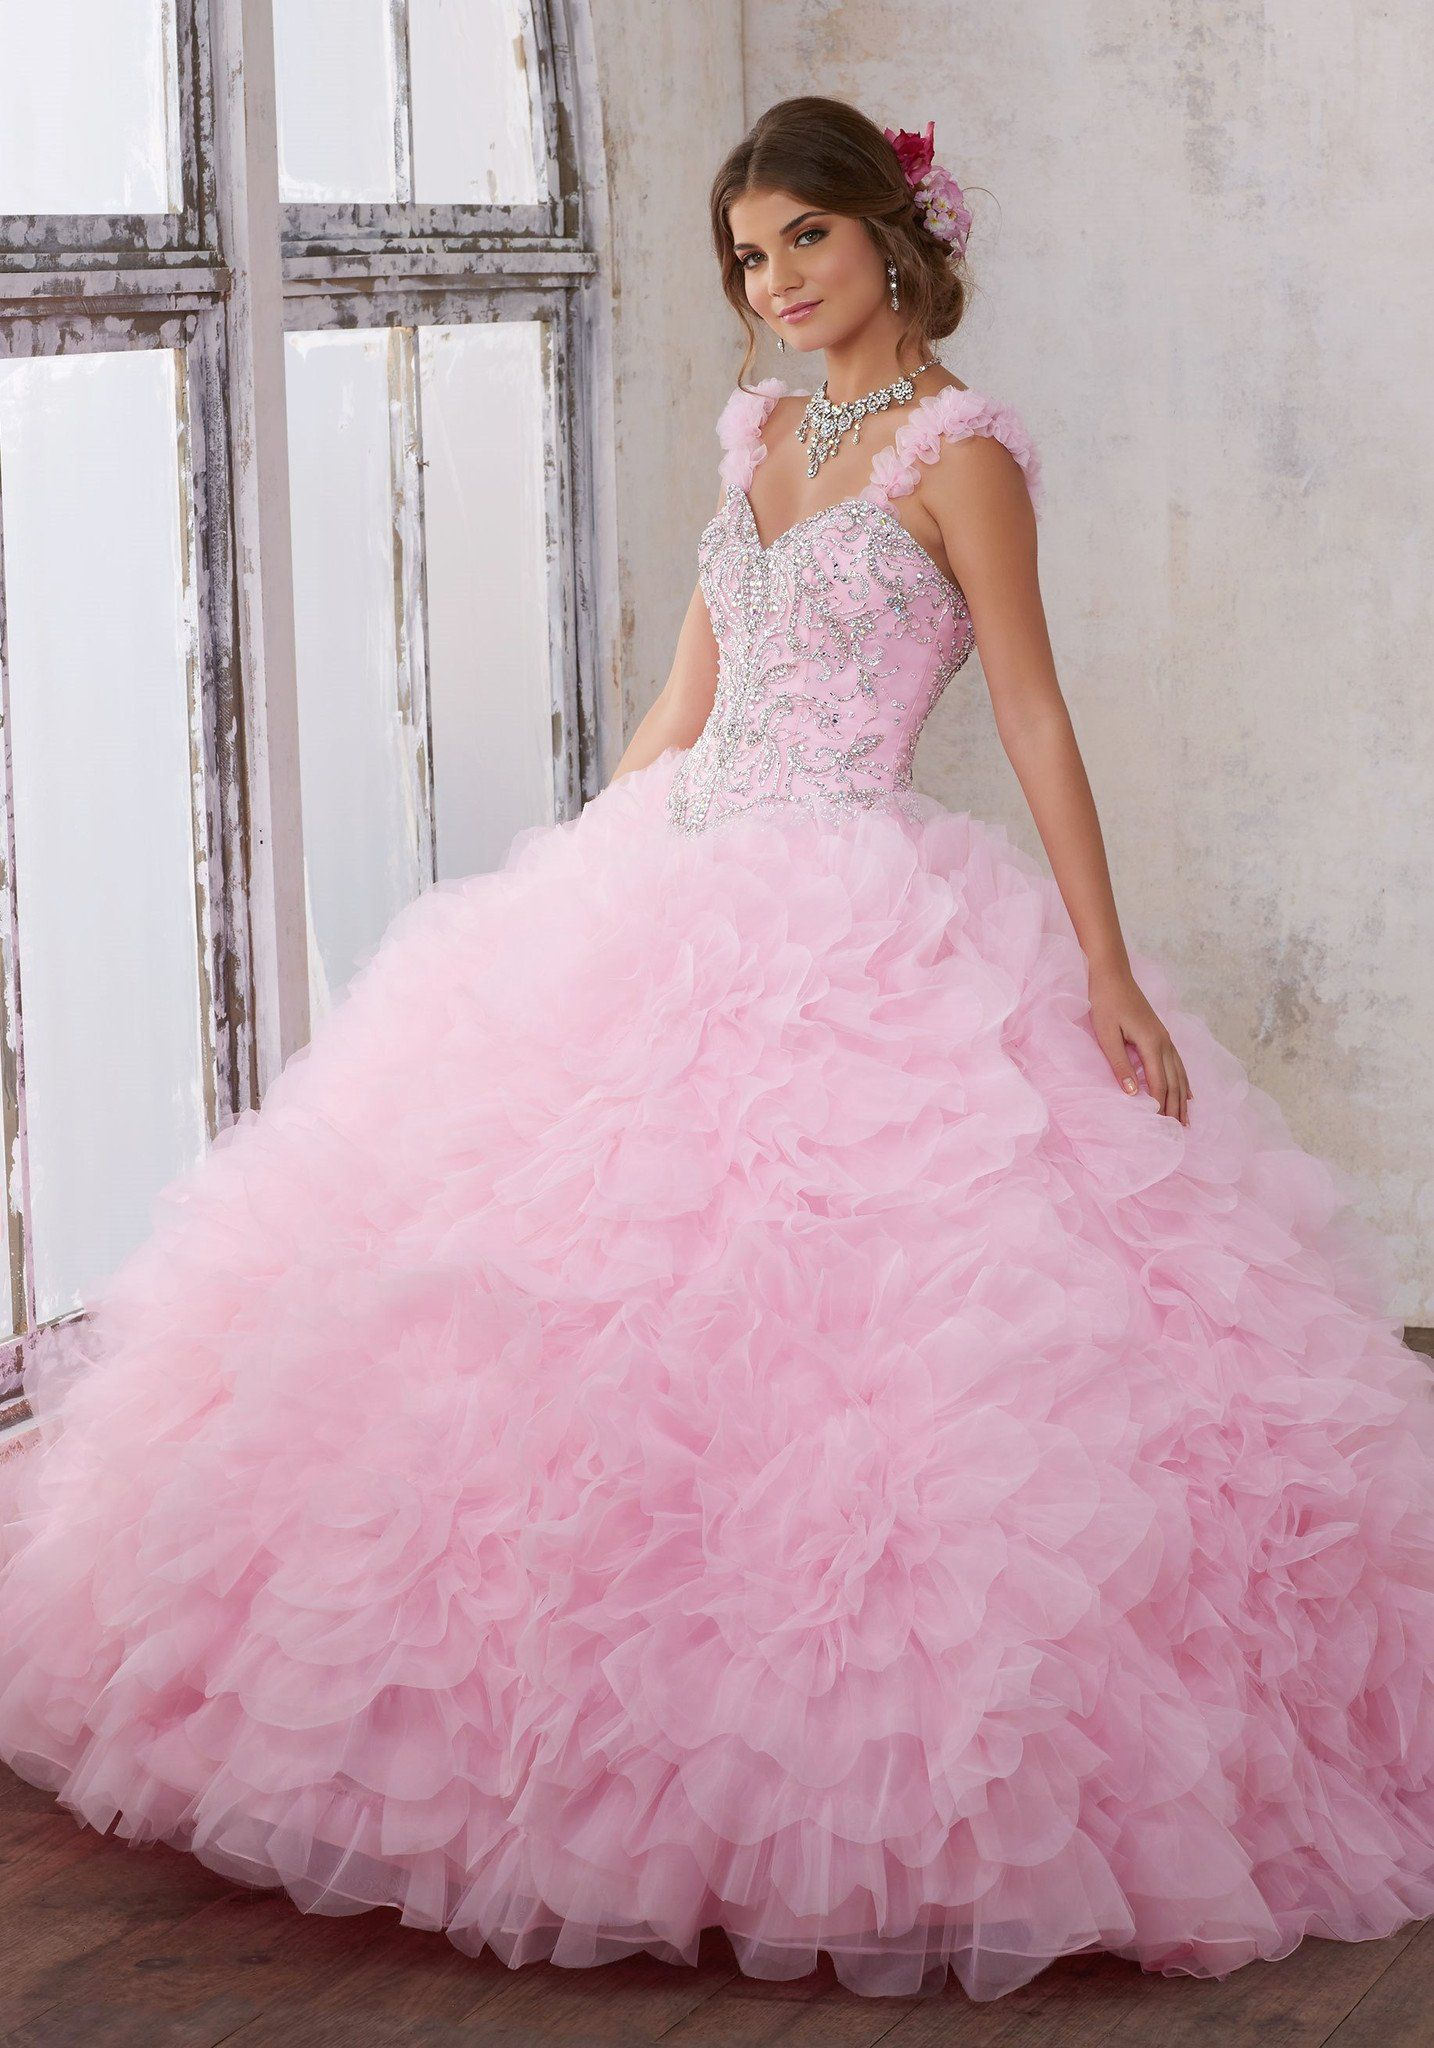 Mori Lee Quinceanera Dress 89137